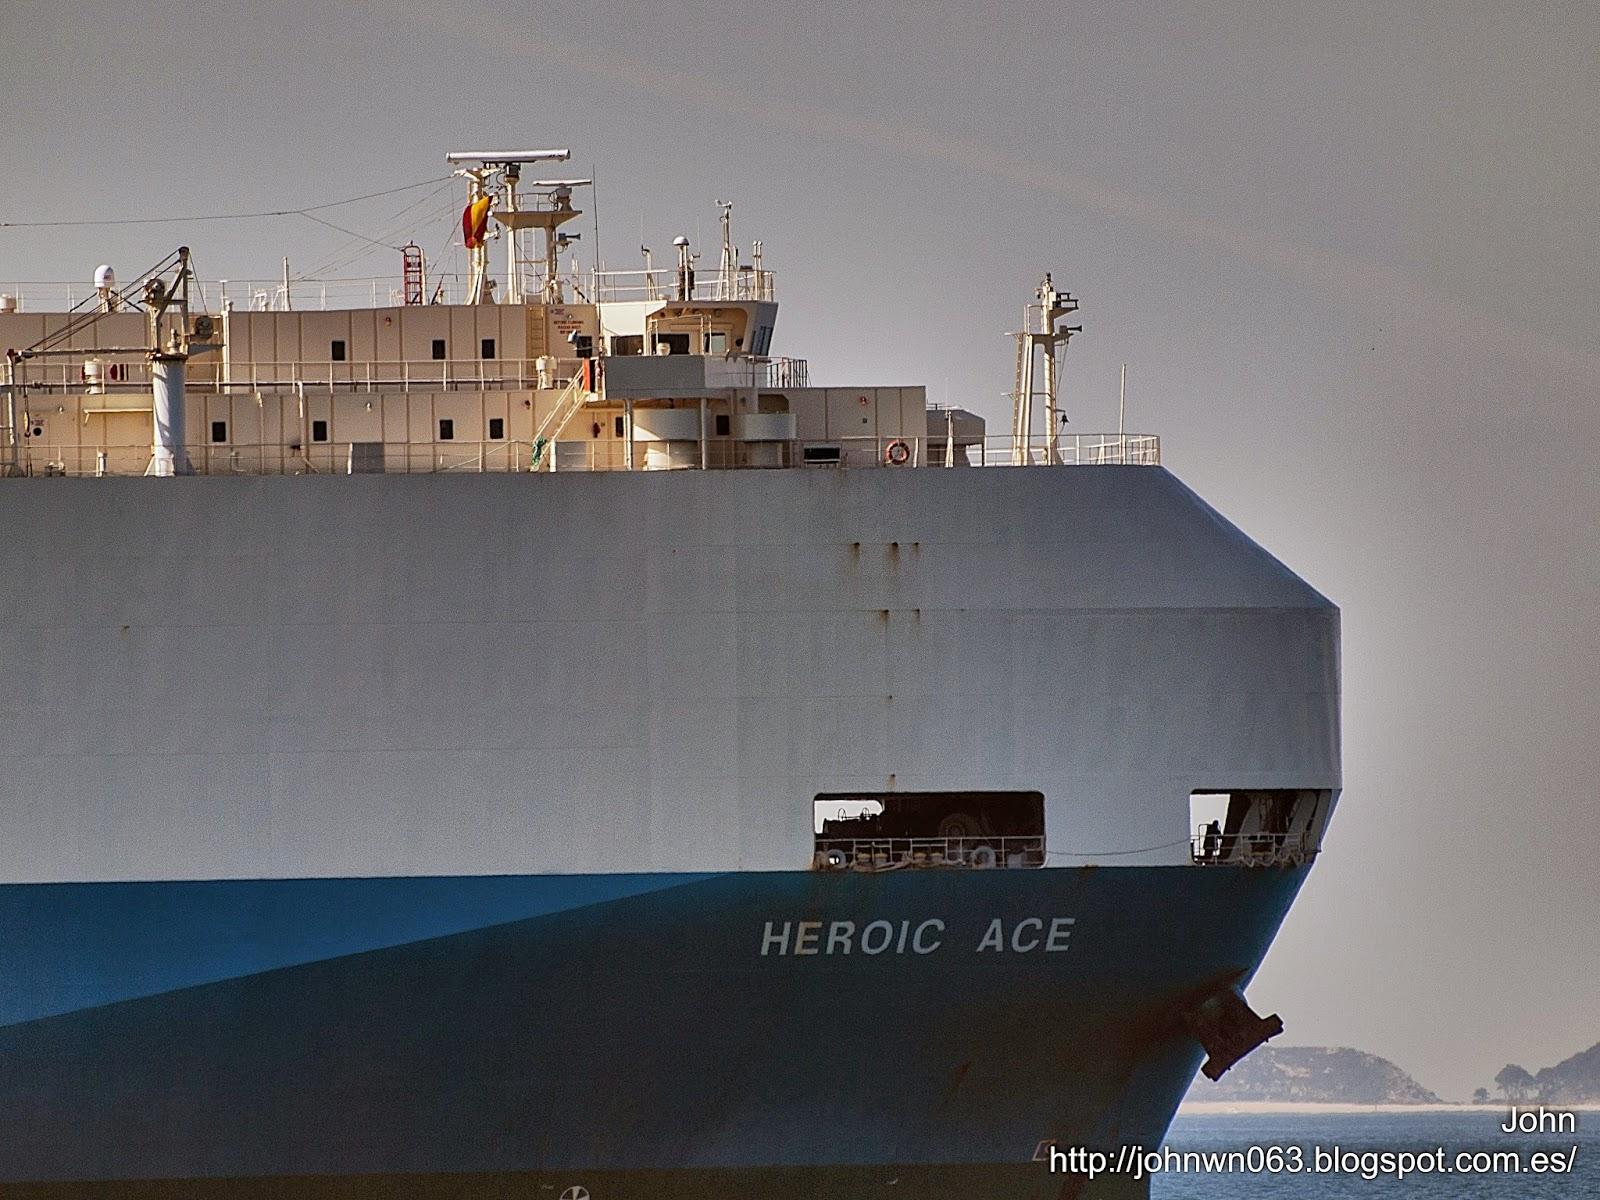 heroic-ace